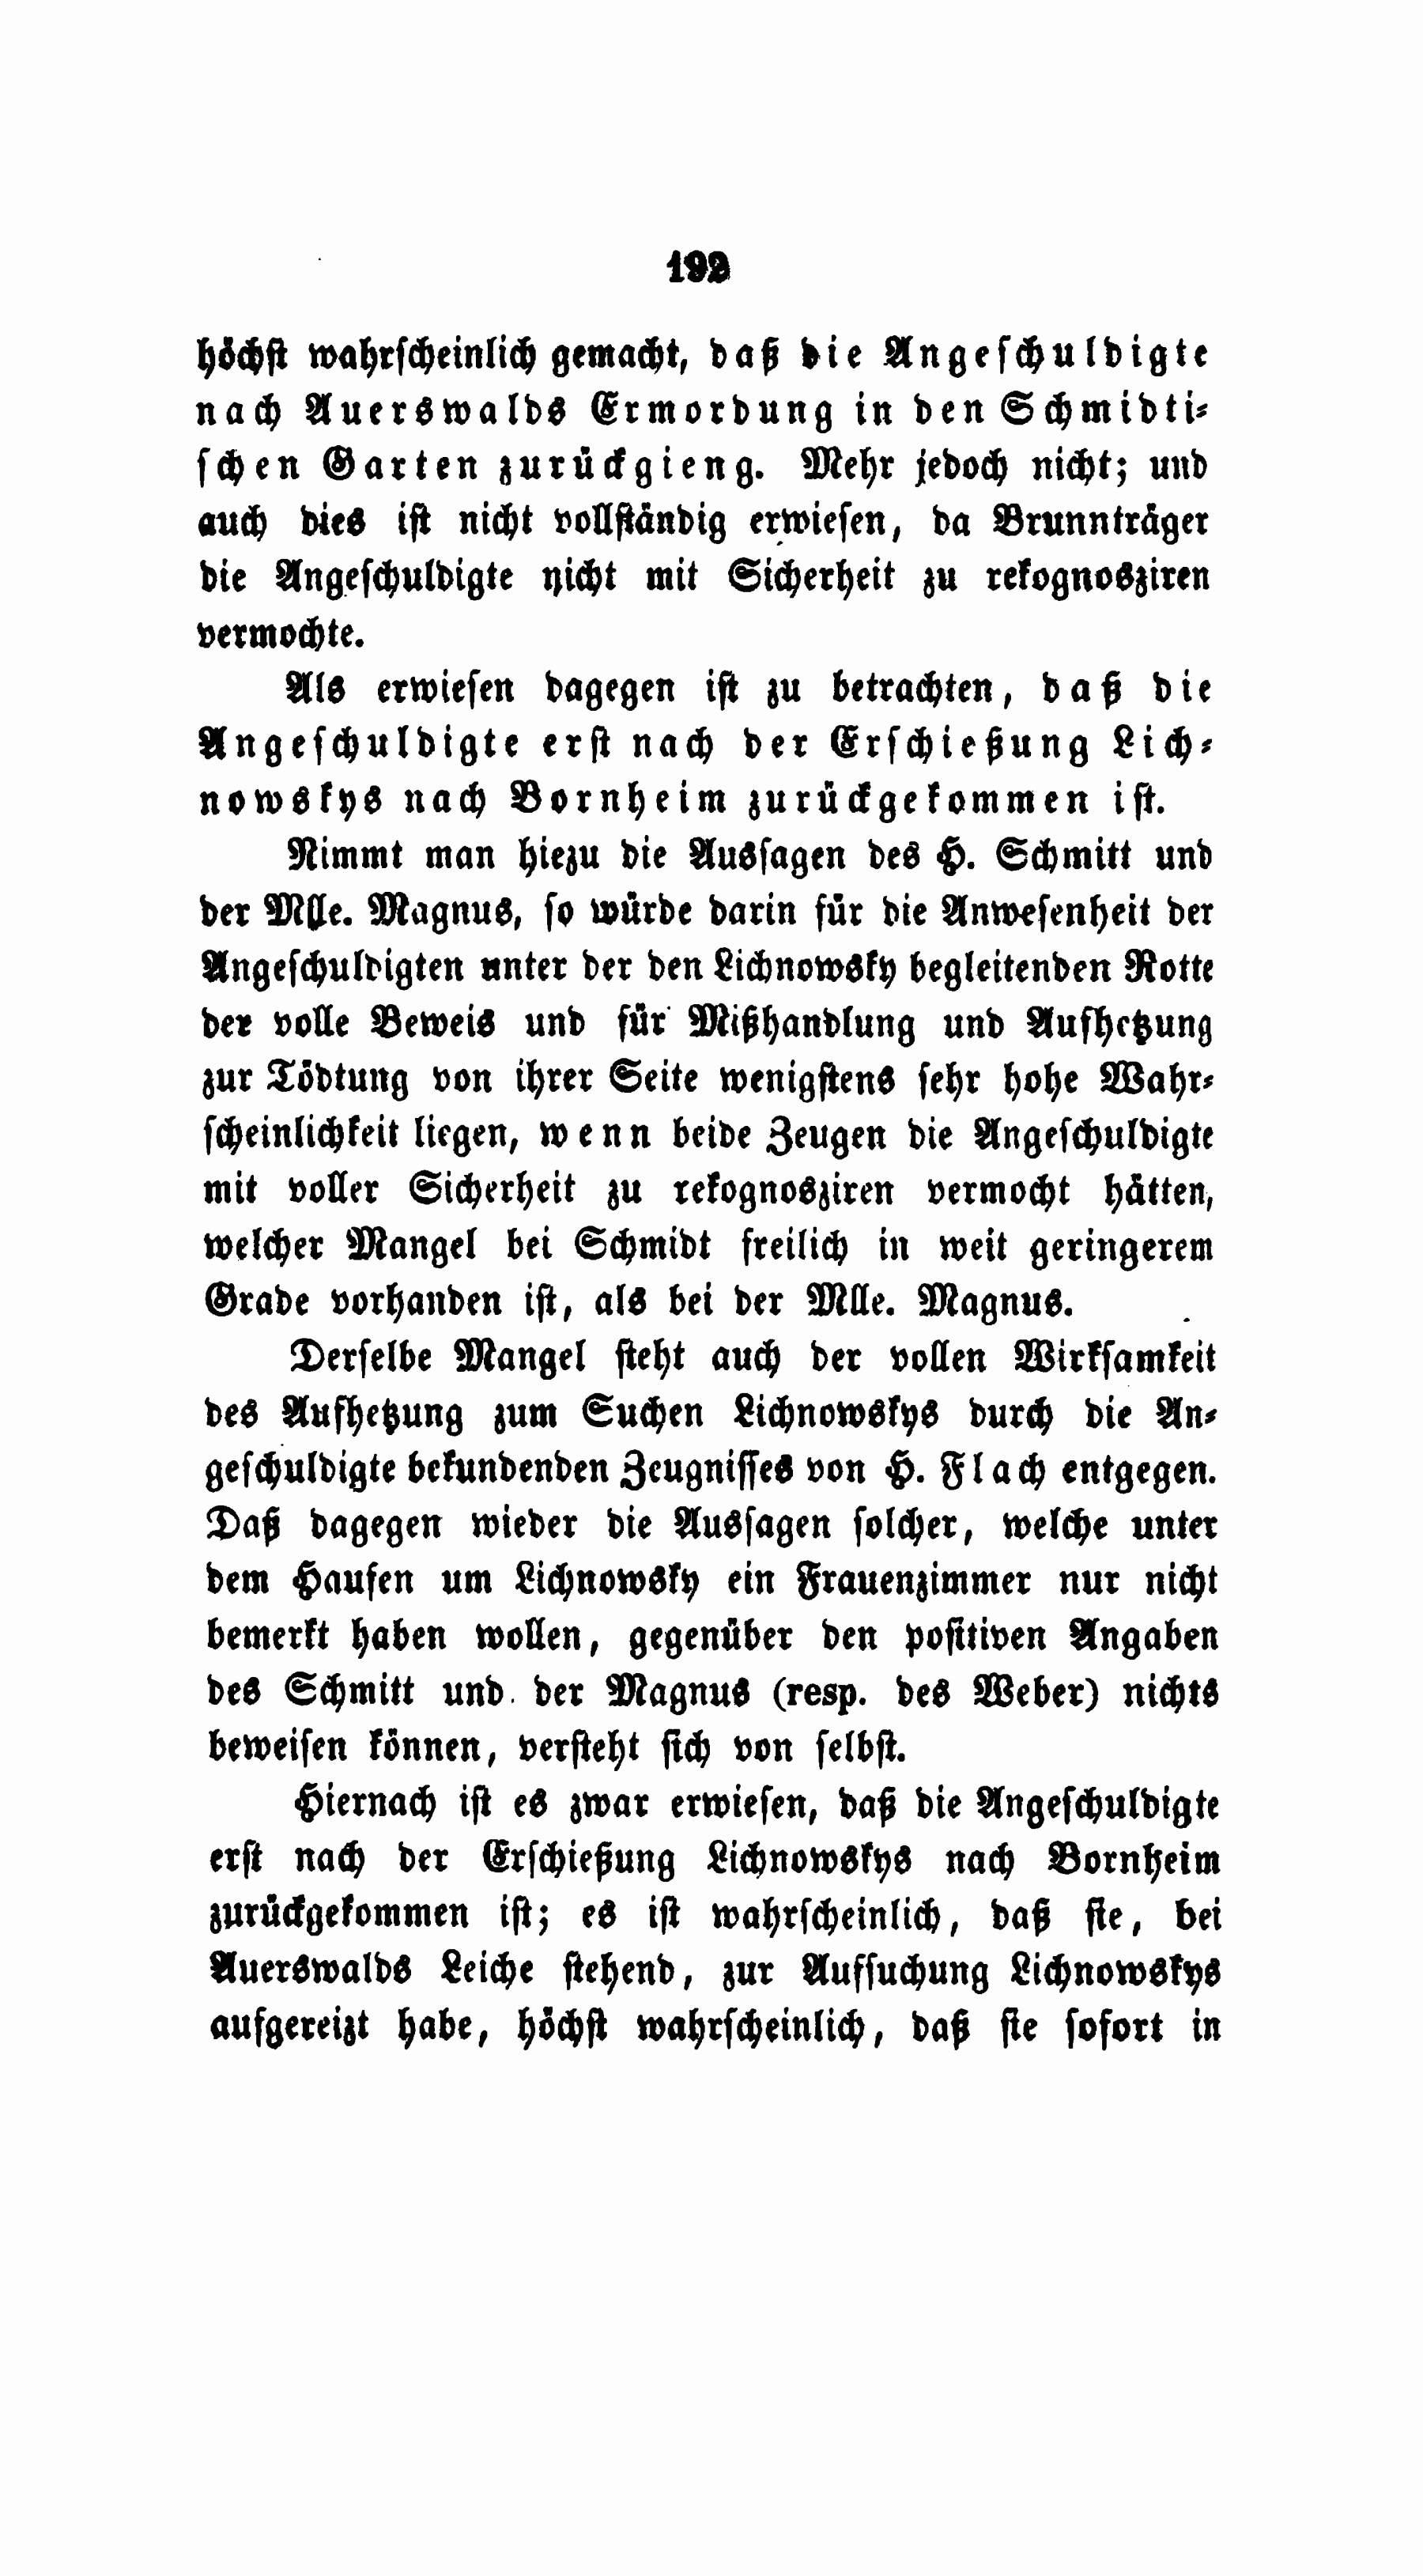 File:De Auerswald und Lichnowsky 192.jpg - Wikimedia Commons